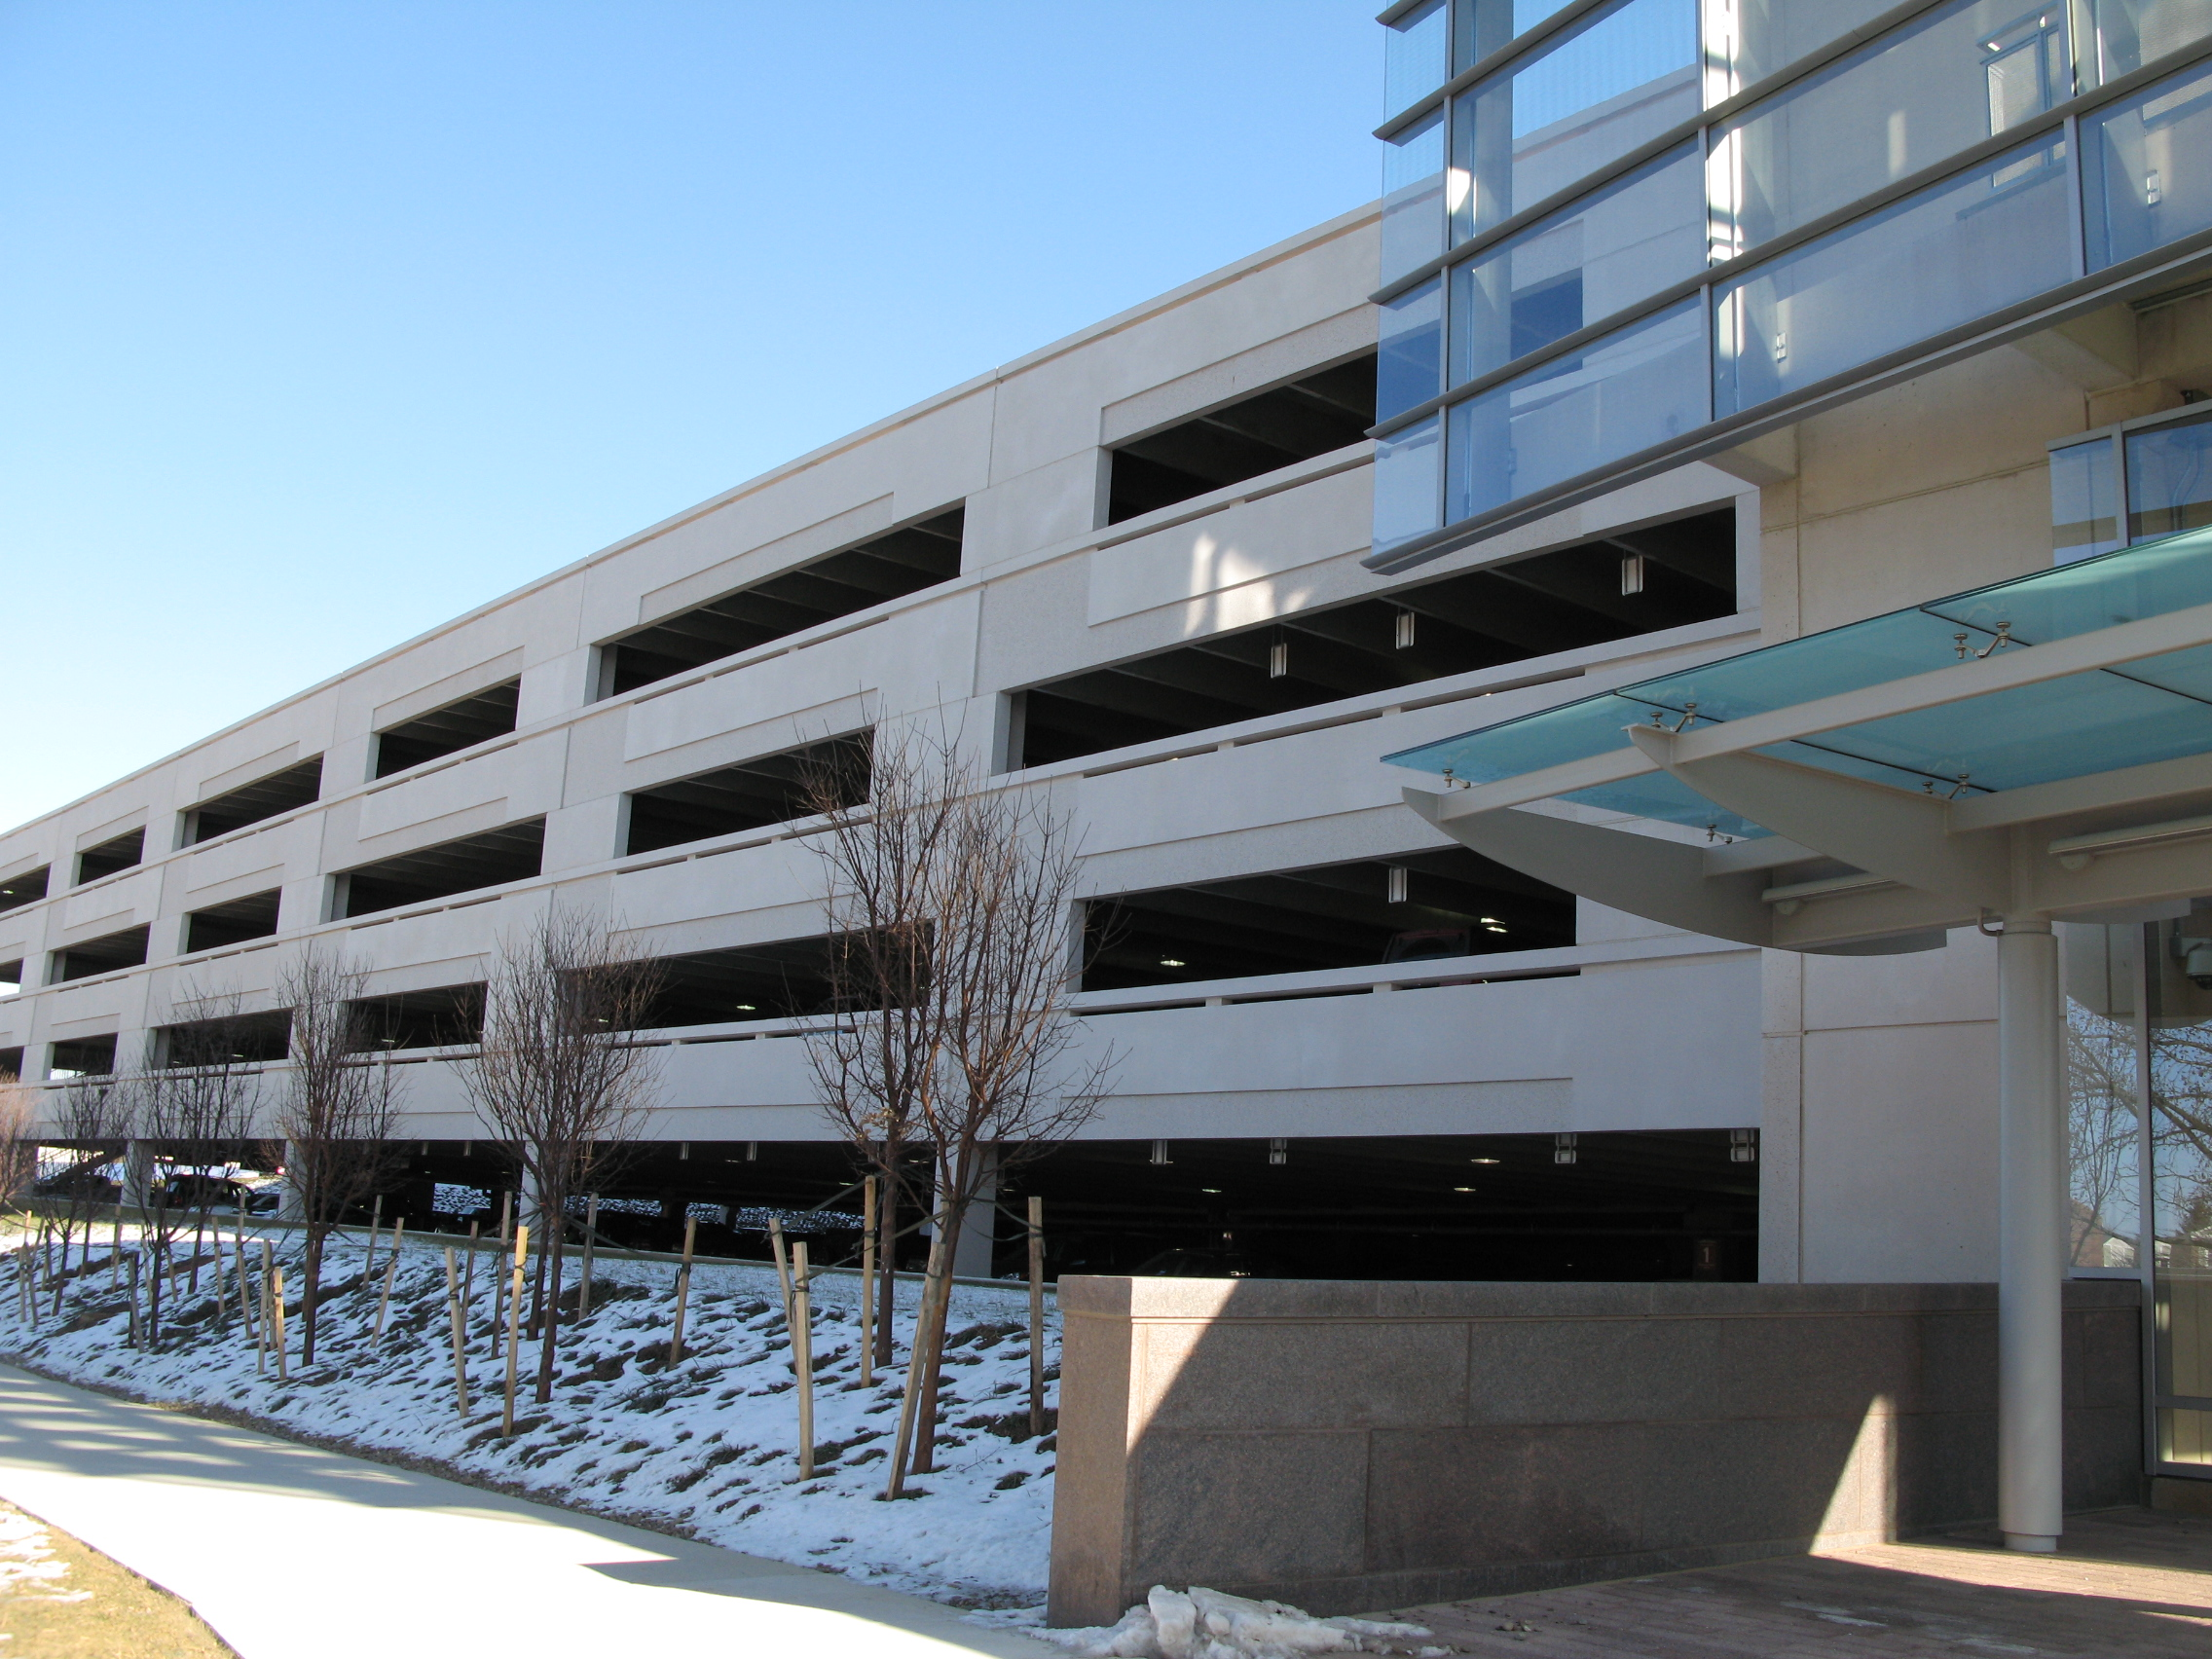 Hershey Medical Parking Garage